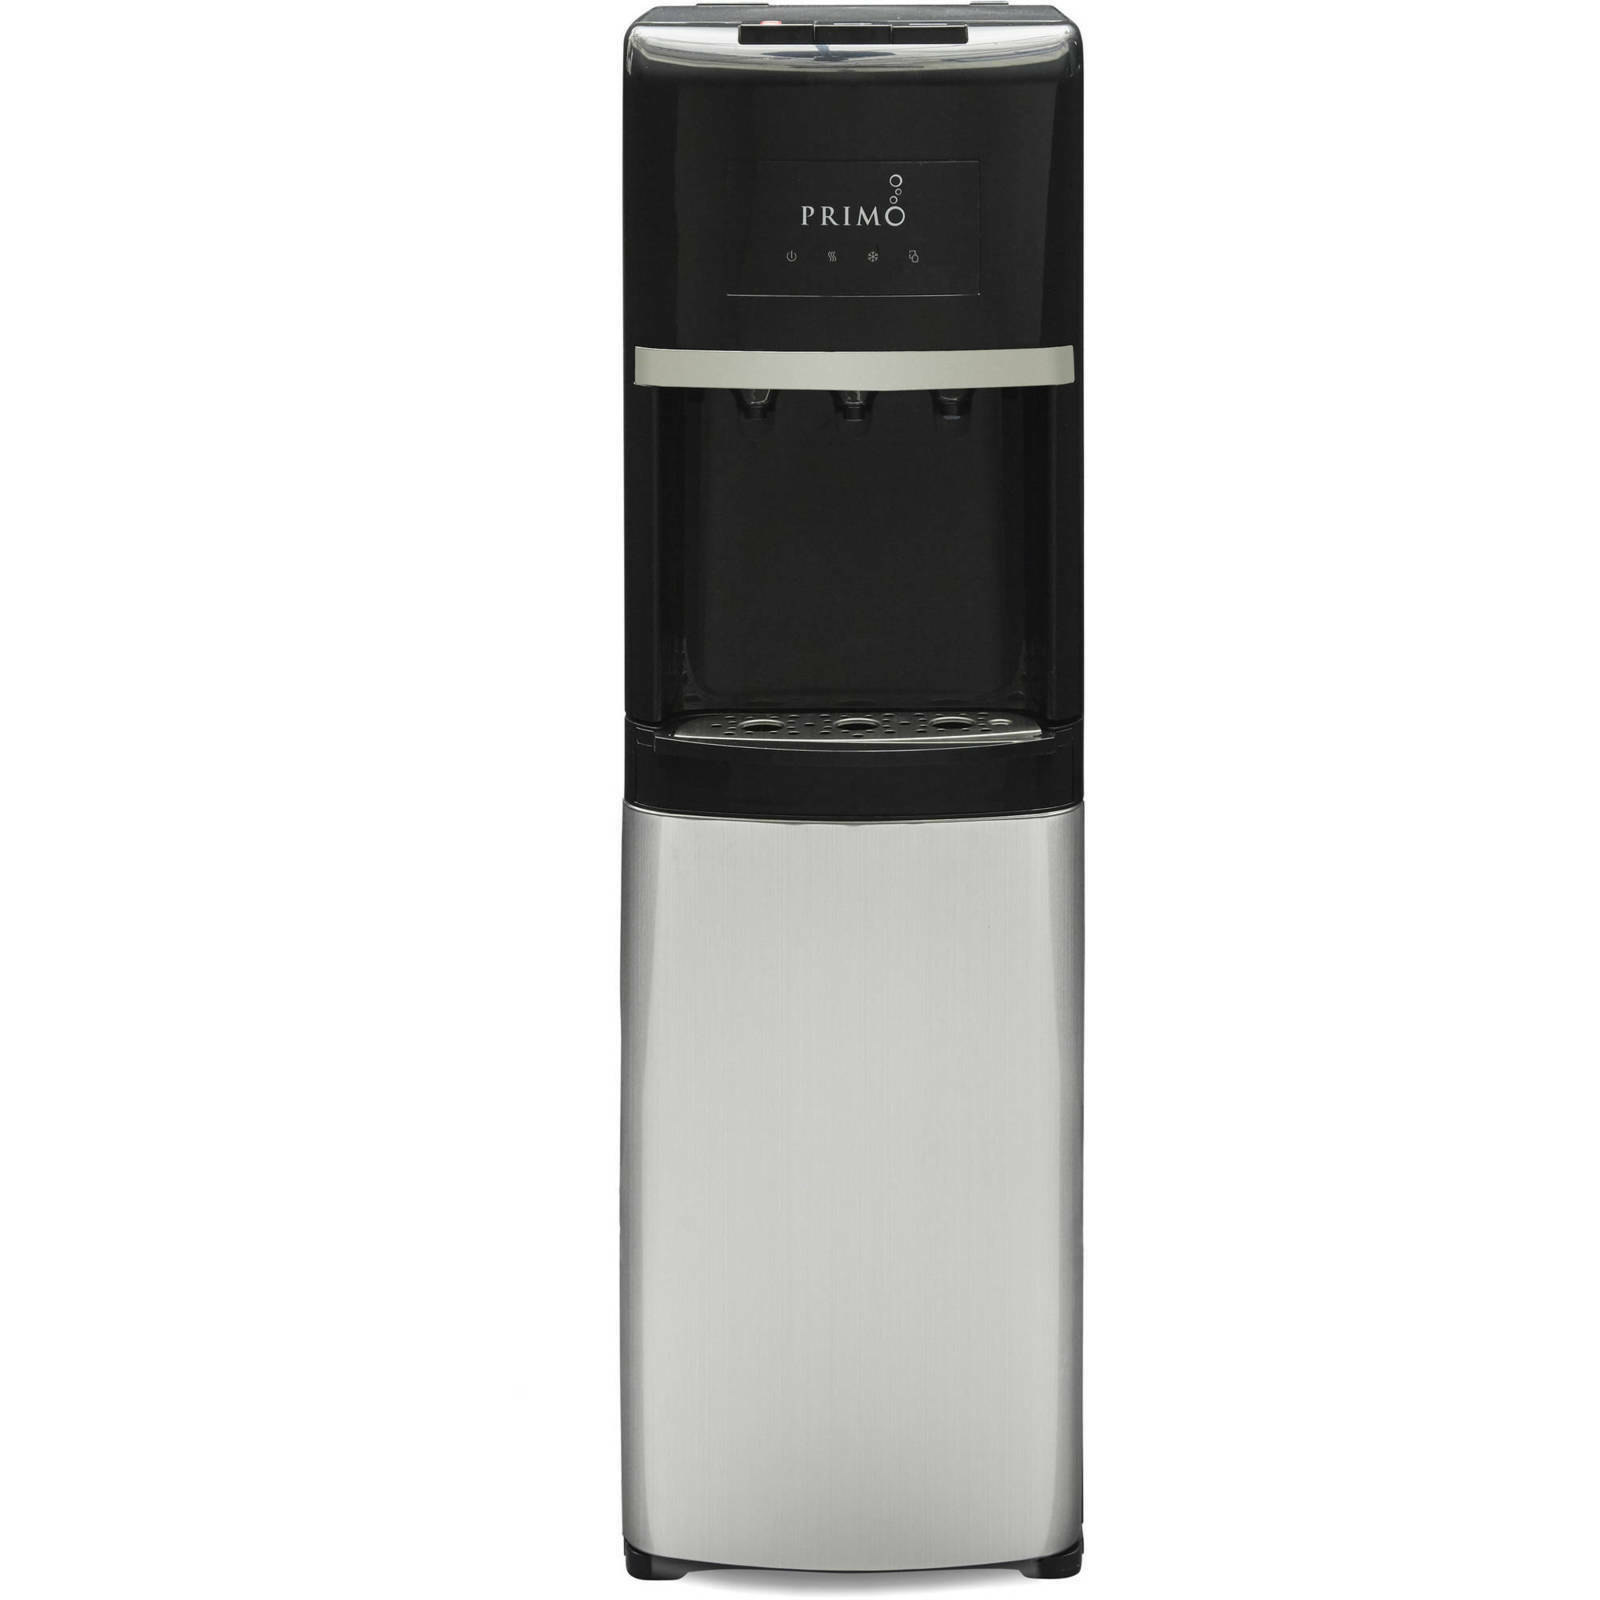 Primo Stainless Steel & Black Bottom Load Bottled Water Disp